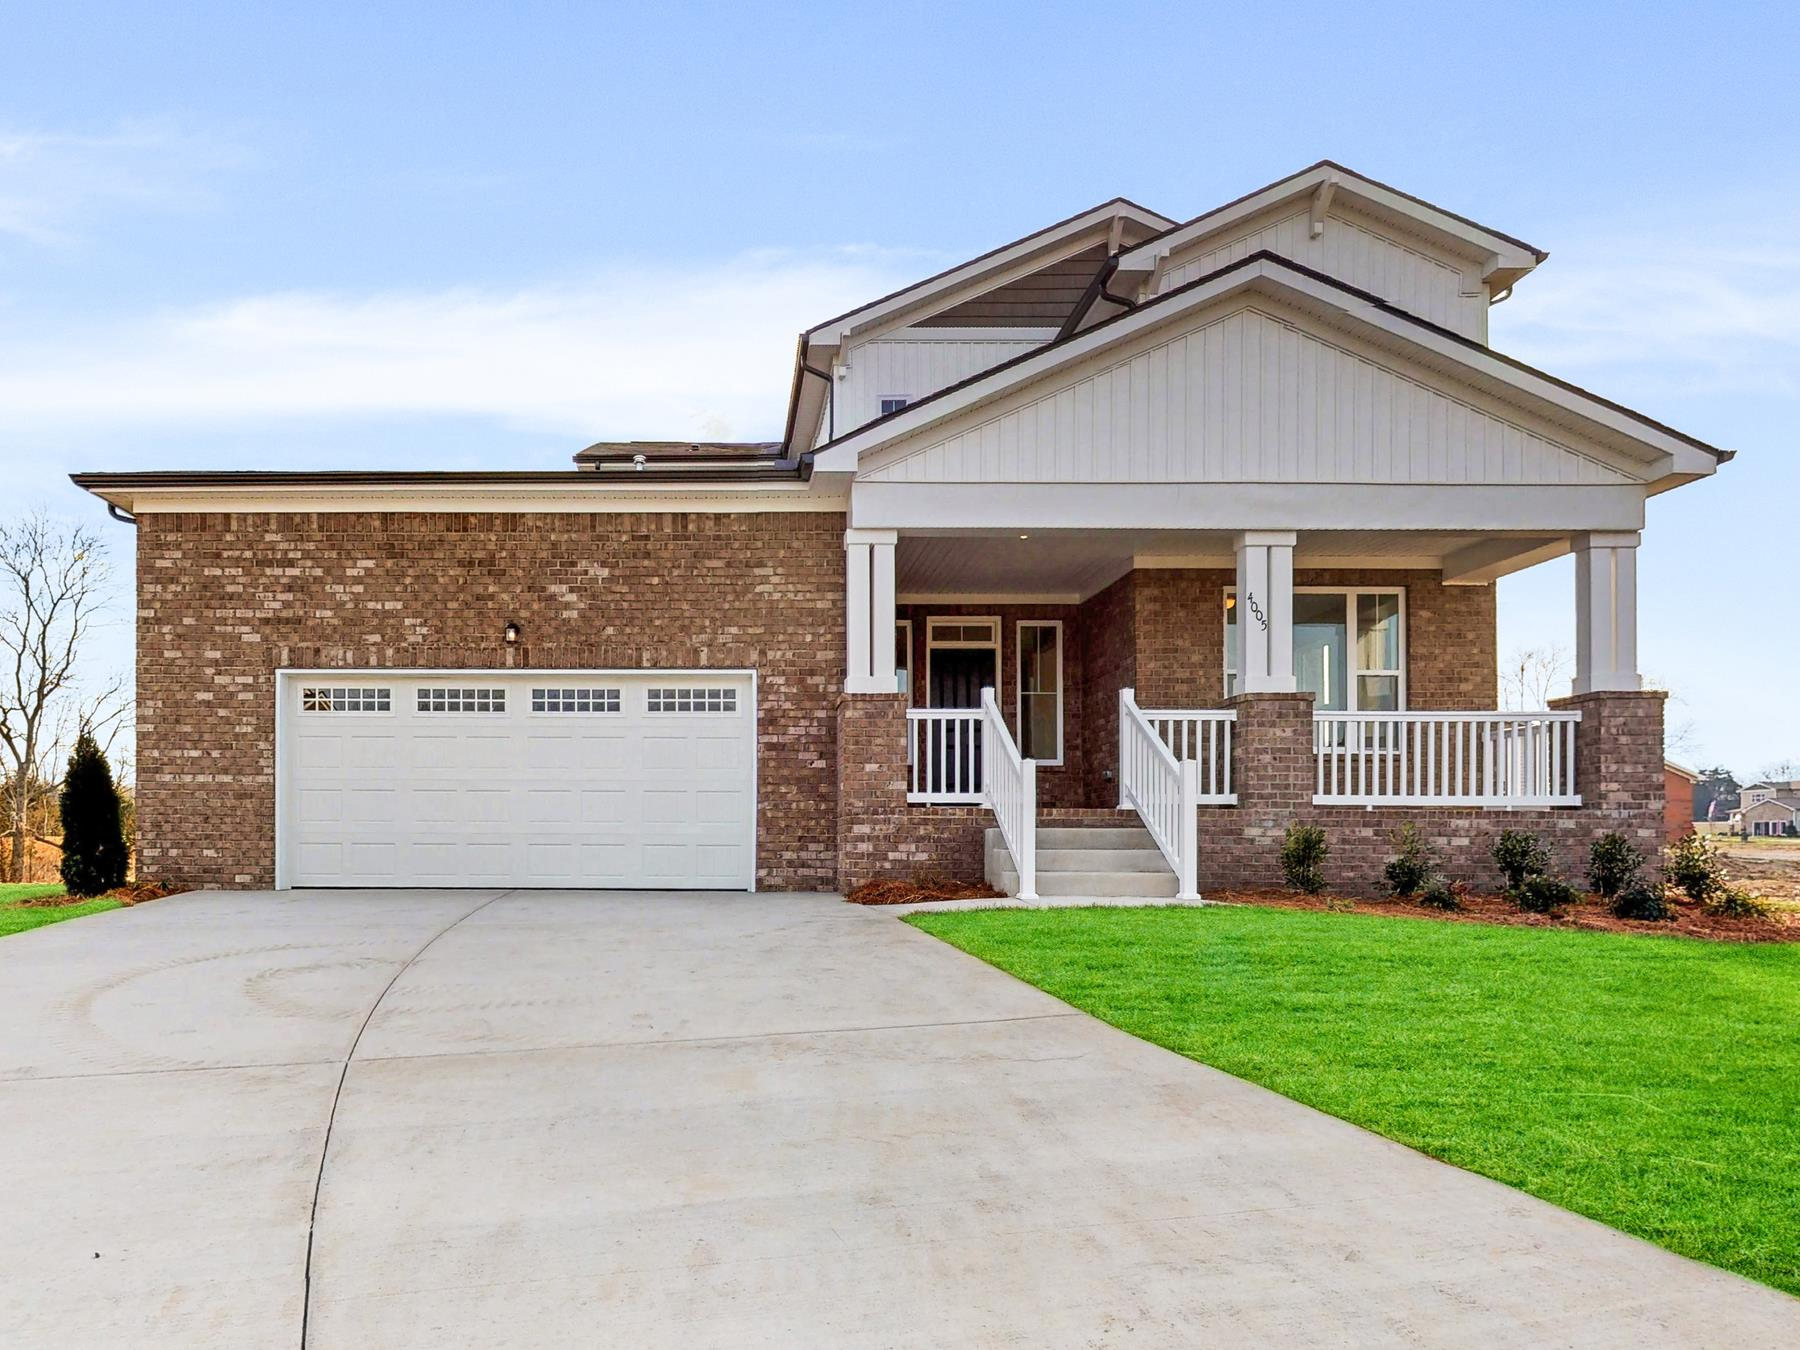 4005 Jacobcrest Ln Lot 35, Murfreesboro, TN 37127 - Murfreesboro, TN real estate listing